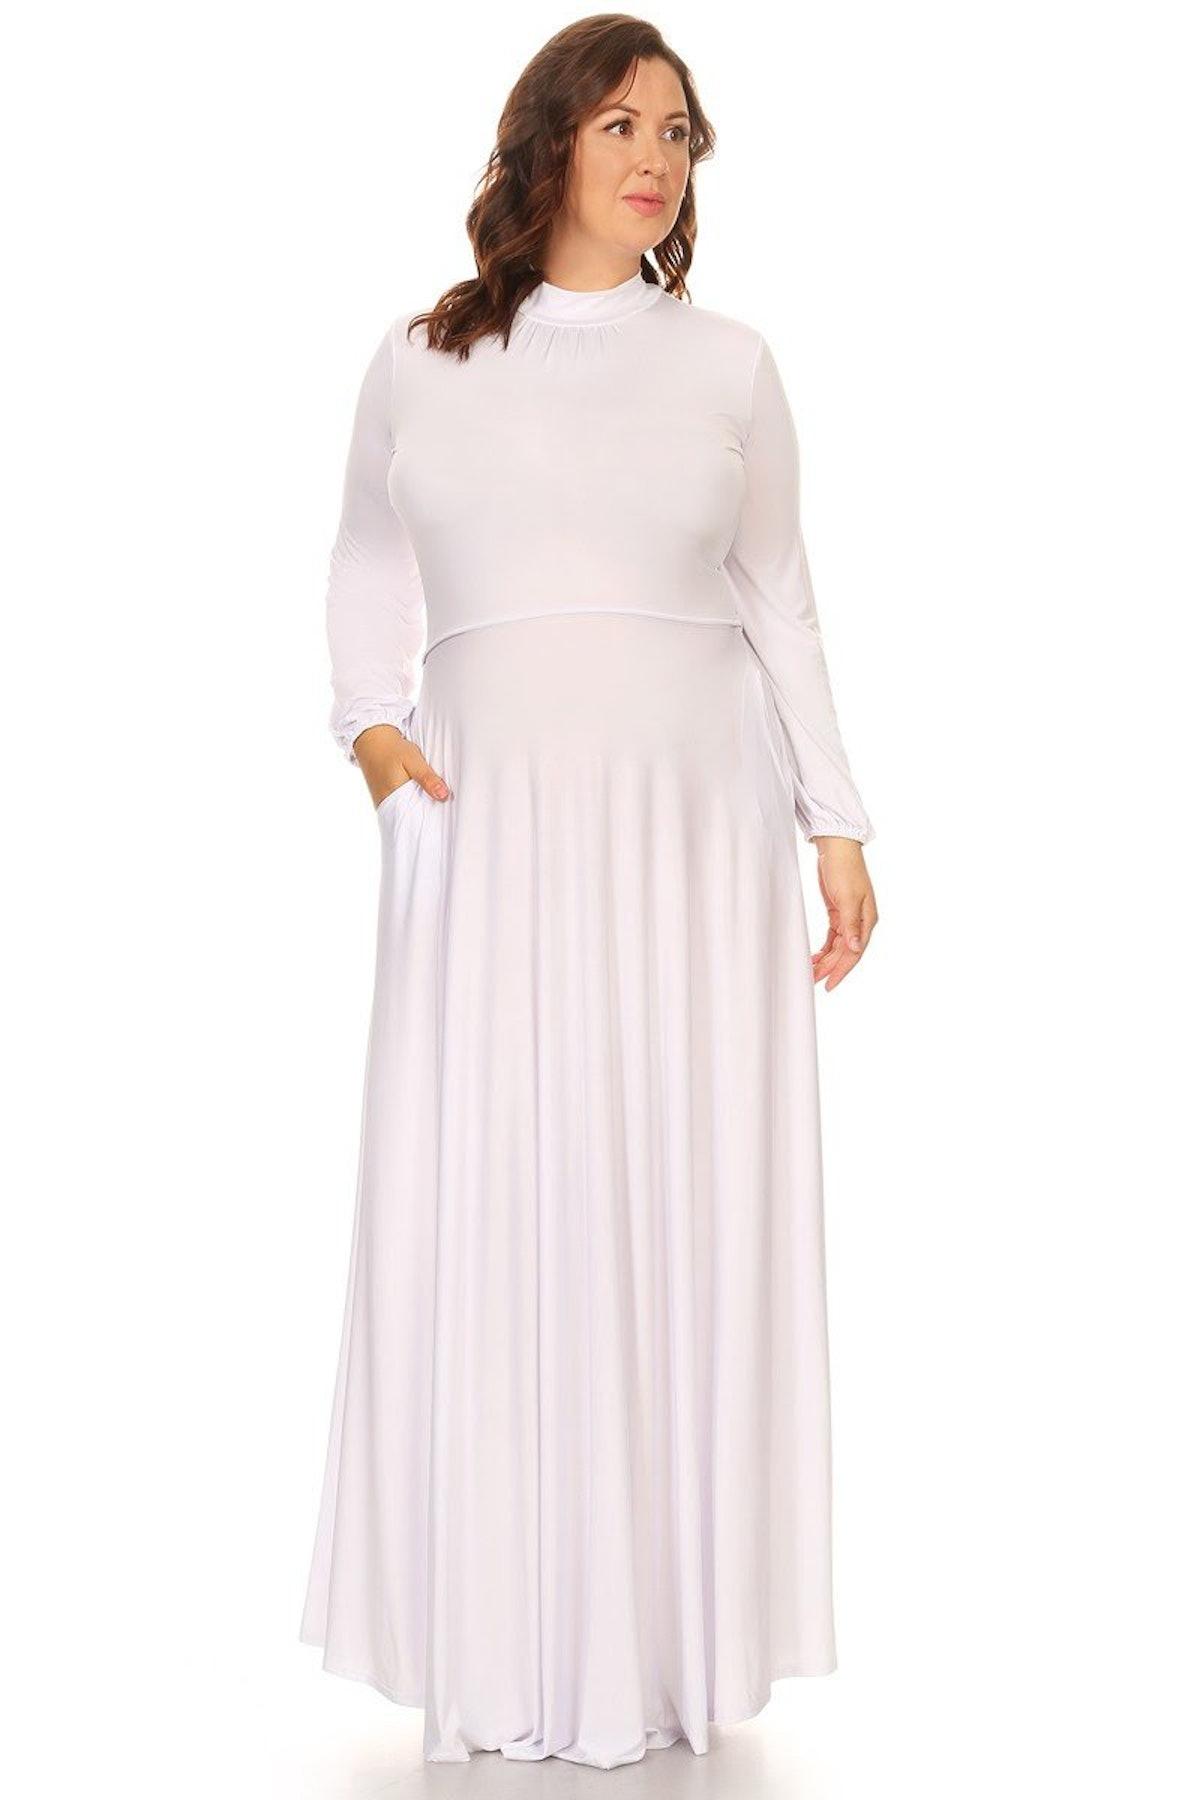 Curvaceous Boutique White Orna Pocket Maxi Dress